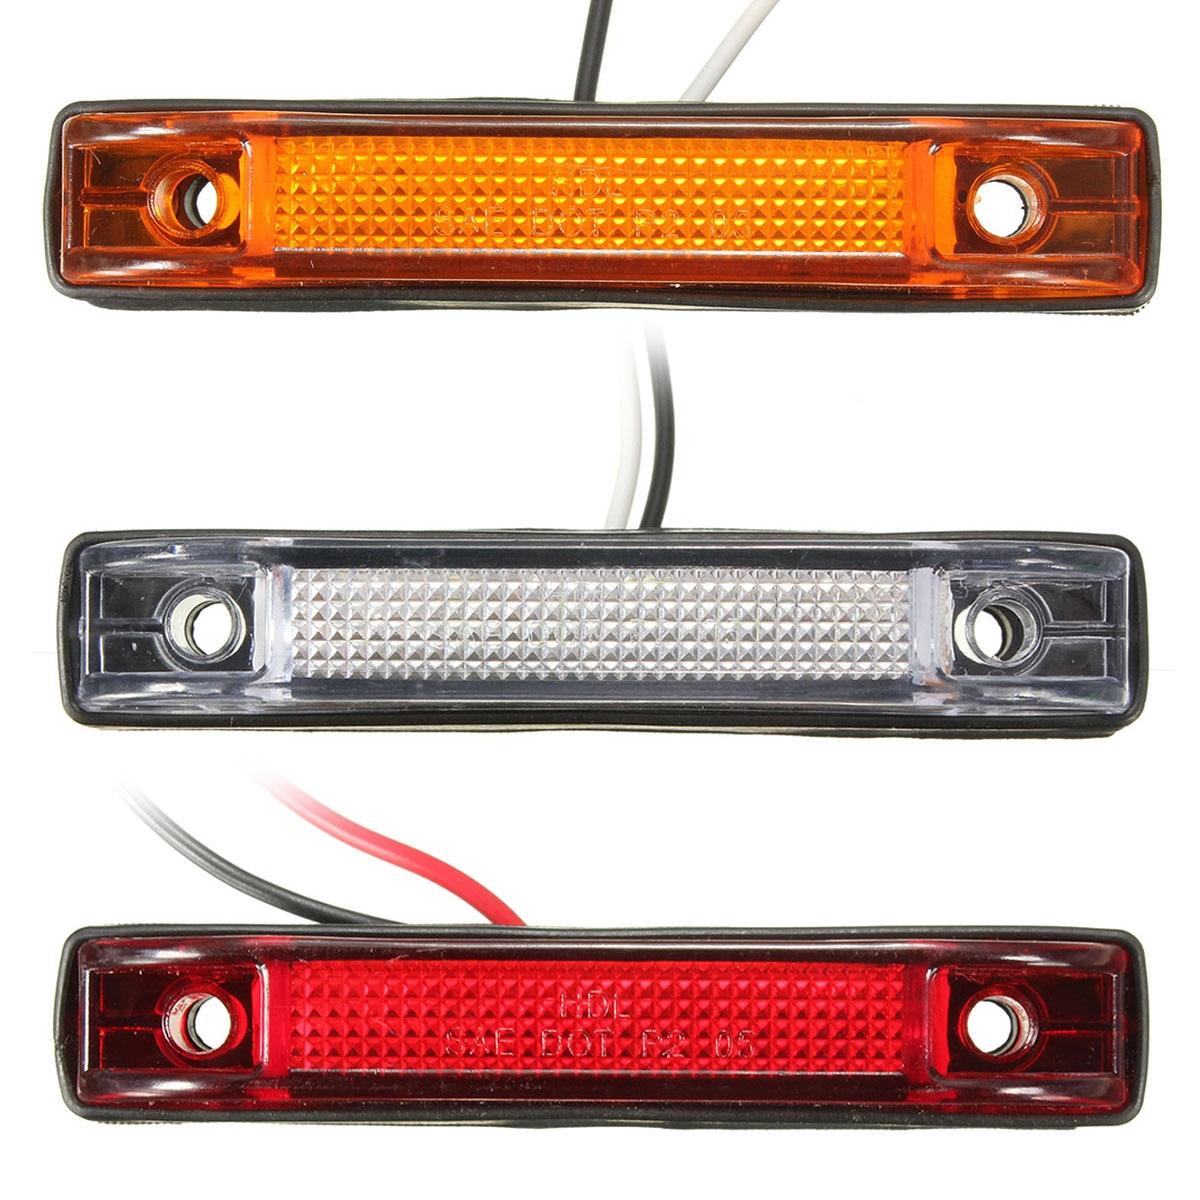 6 Led Utility Led Car Truck Side Marker Clearance Light